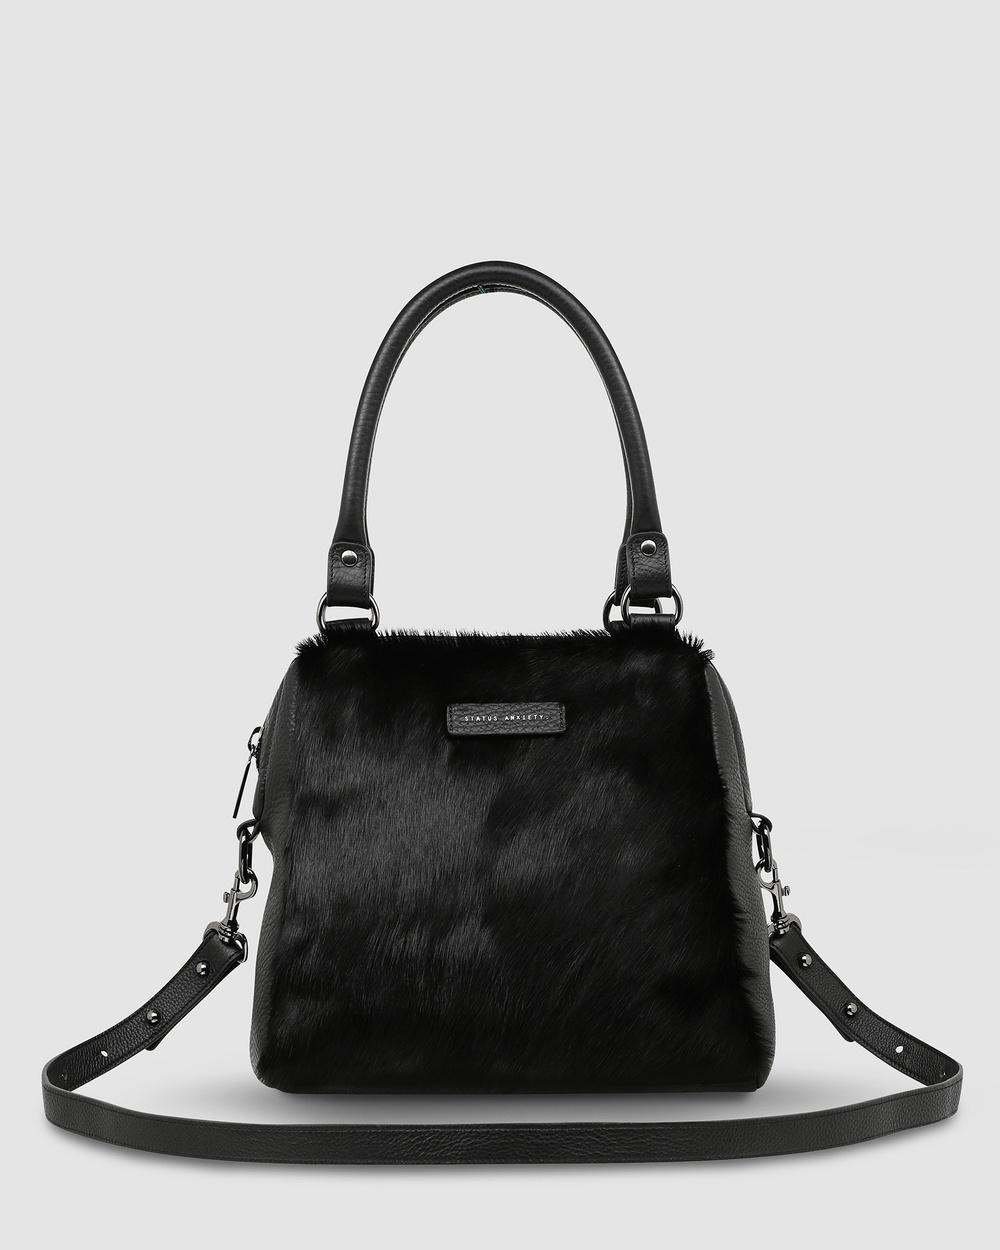 Status Anxiety Last Mountains Handbag Satchels Black Fur Leather bags Australia